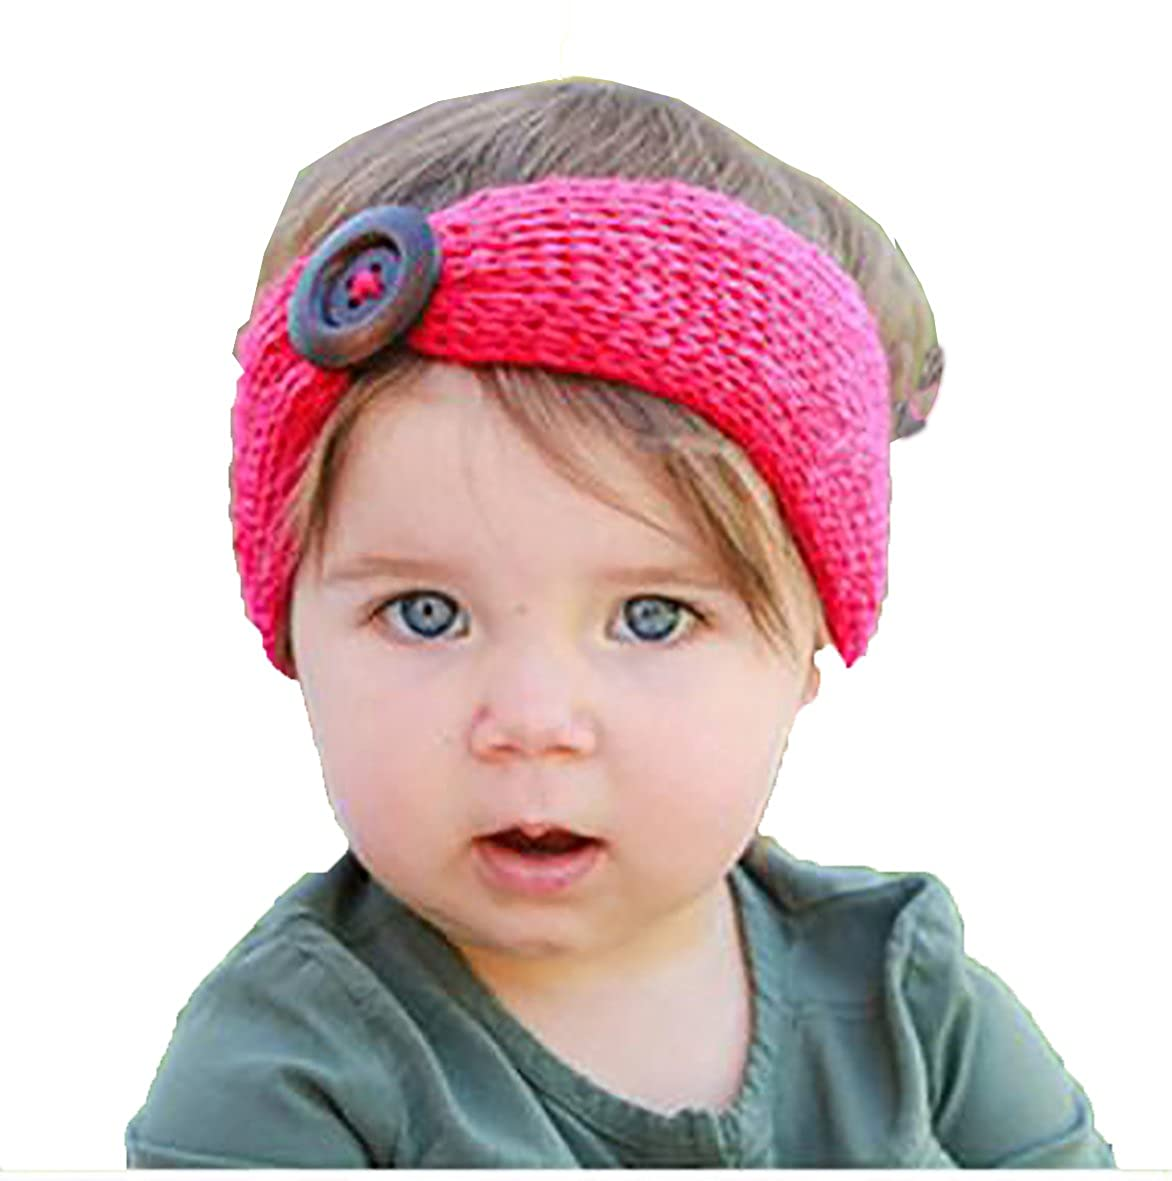 e844d31cc1f62 ZioryPink Baby Girl Baby Boy Unisex Knit Crochet Turban Headband Warm  Headbands for Newborn Hair Head Bowknot Band Hairband Photography Props  ornaments